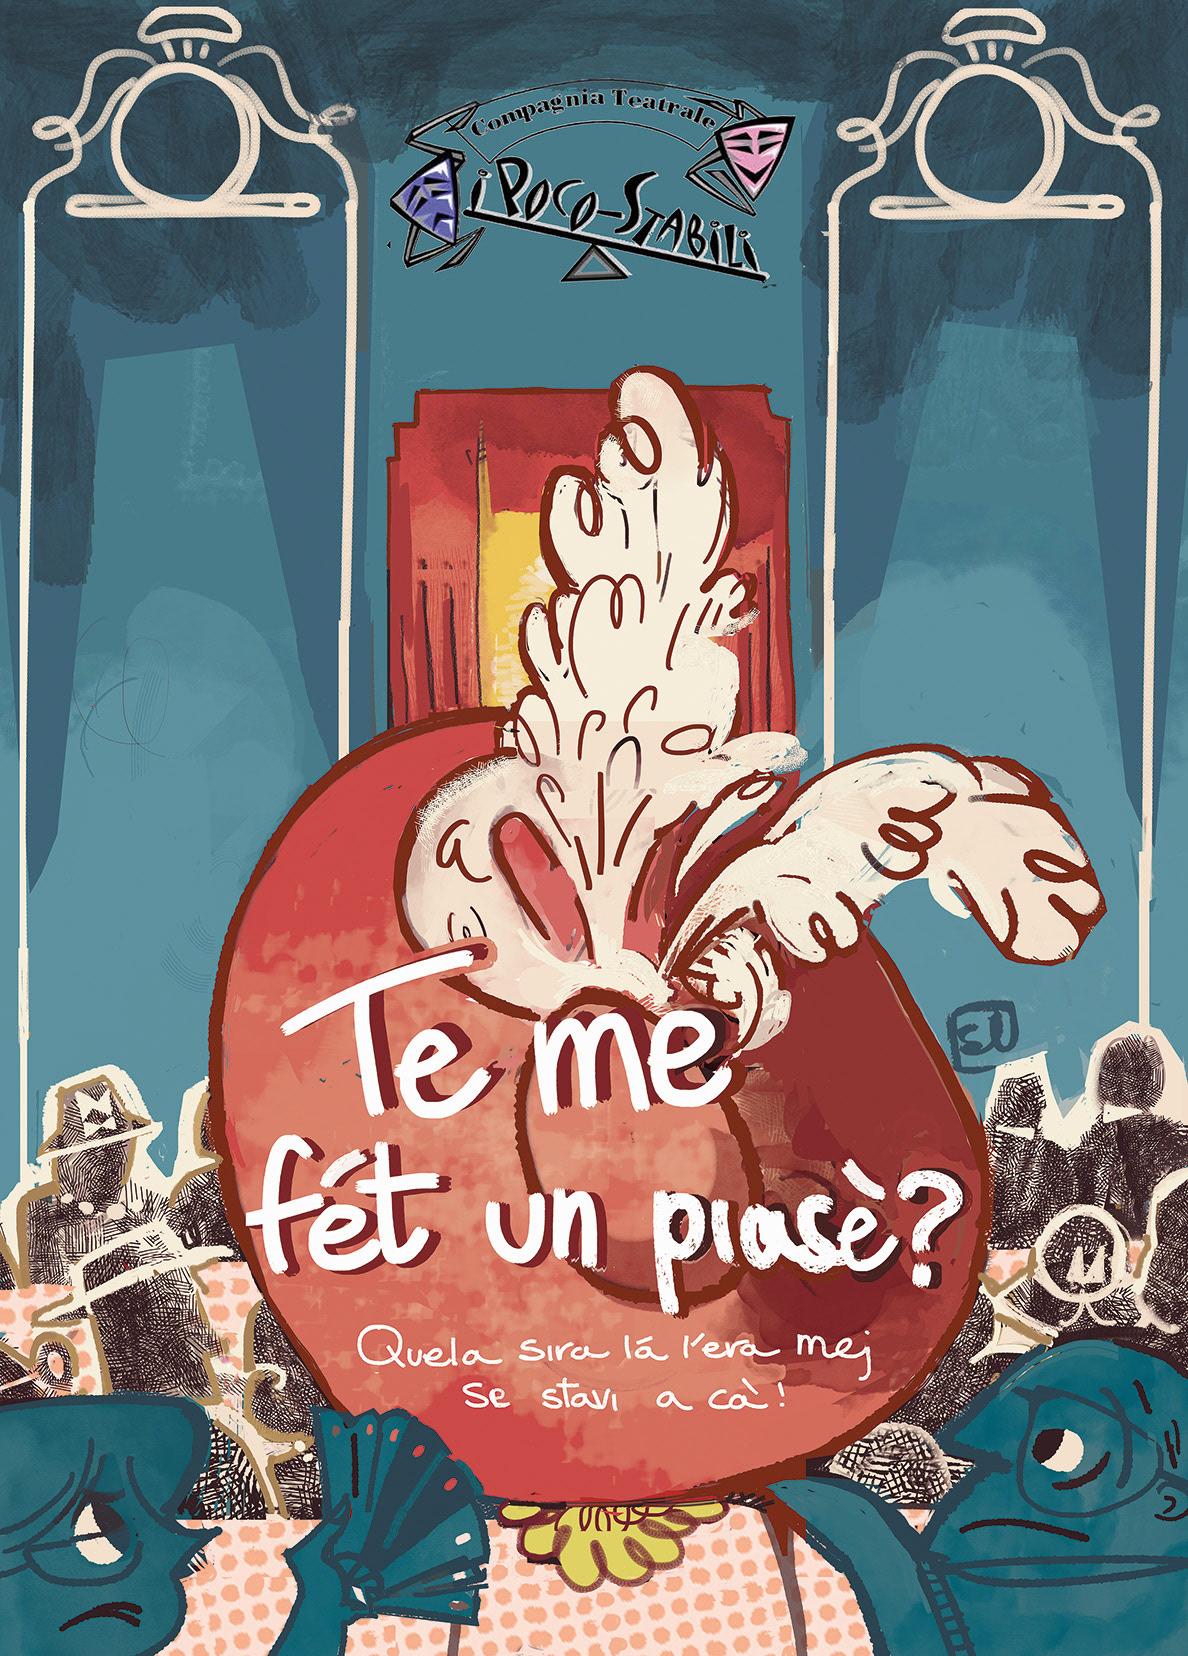 Te me fét un piaséè, teatro, theater, teatro locale, dialetto, locandina, cantù, i poco stabili, hat, funny